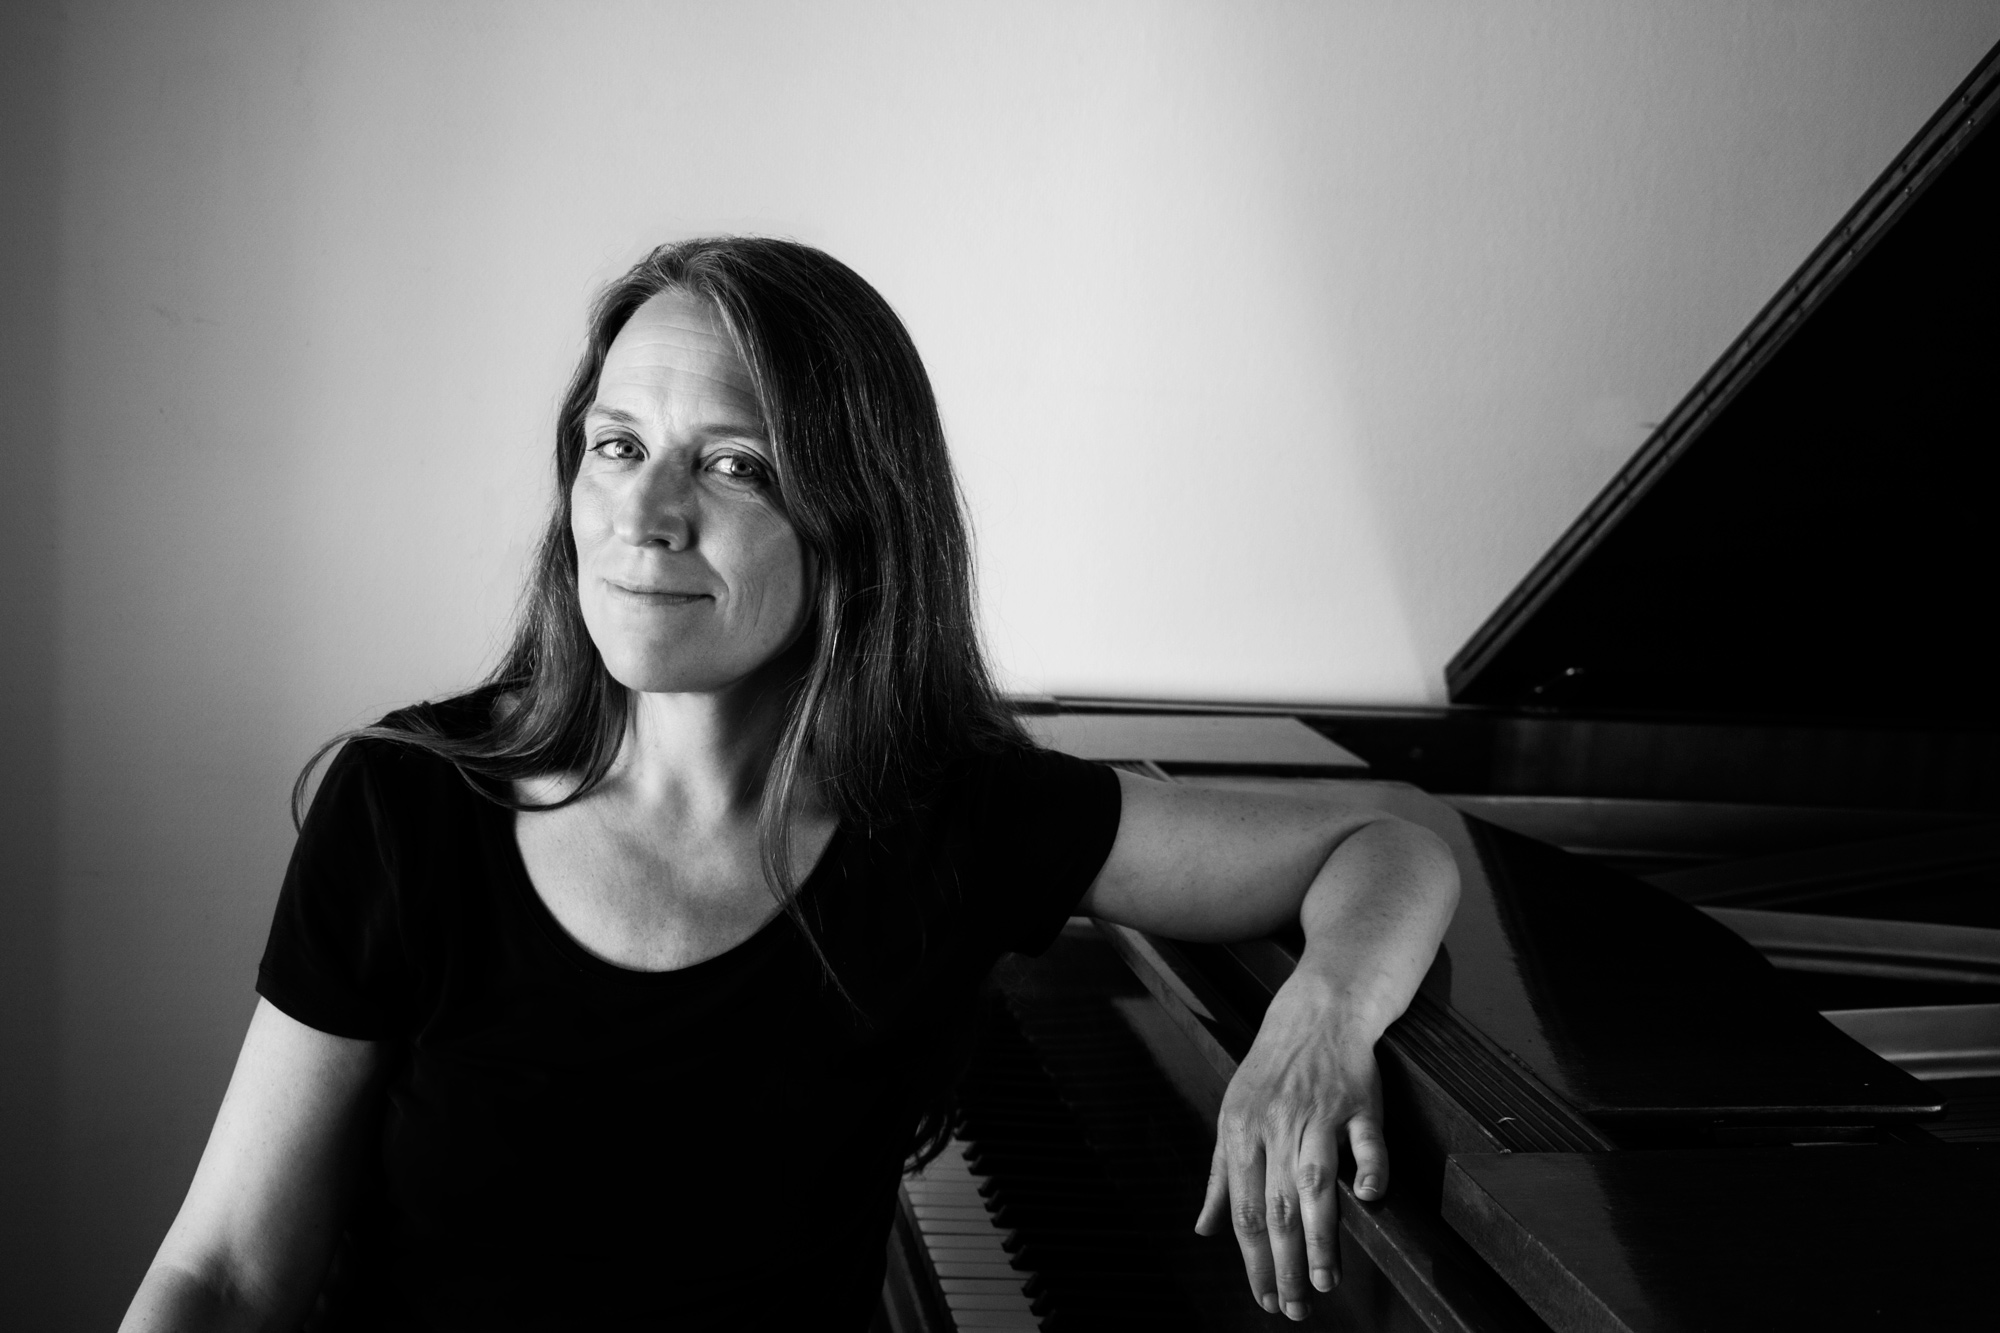 Maria Grönlund, Pianist and Composer.